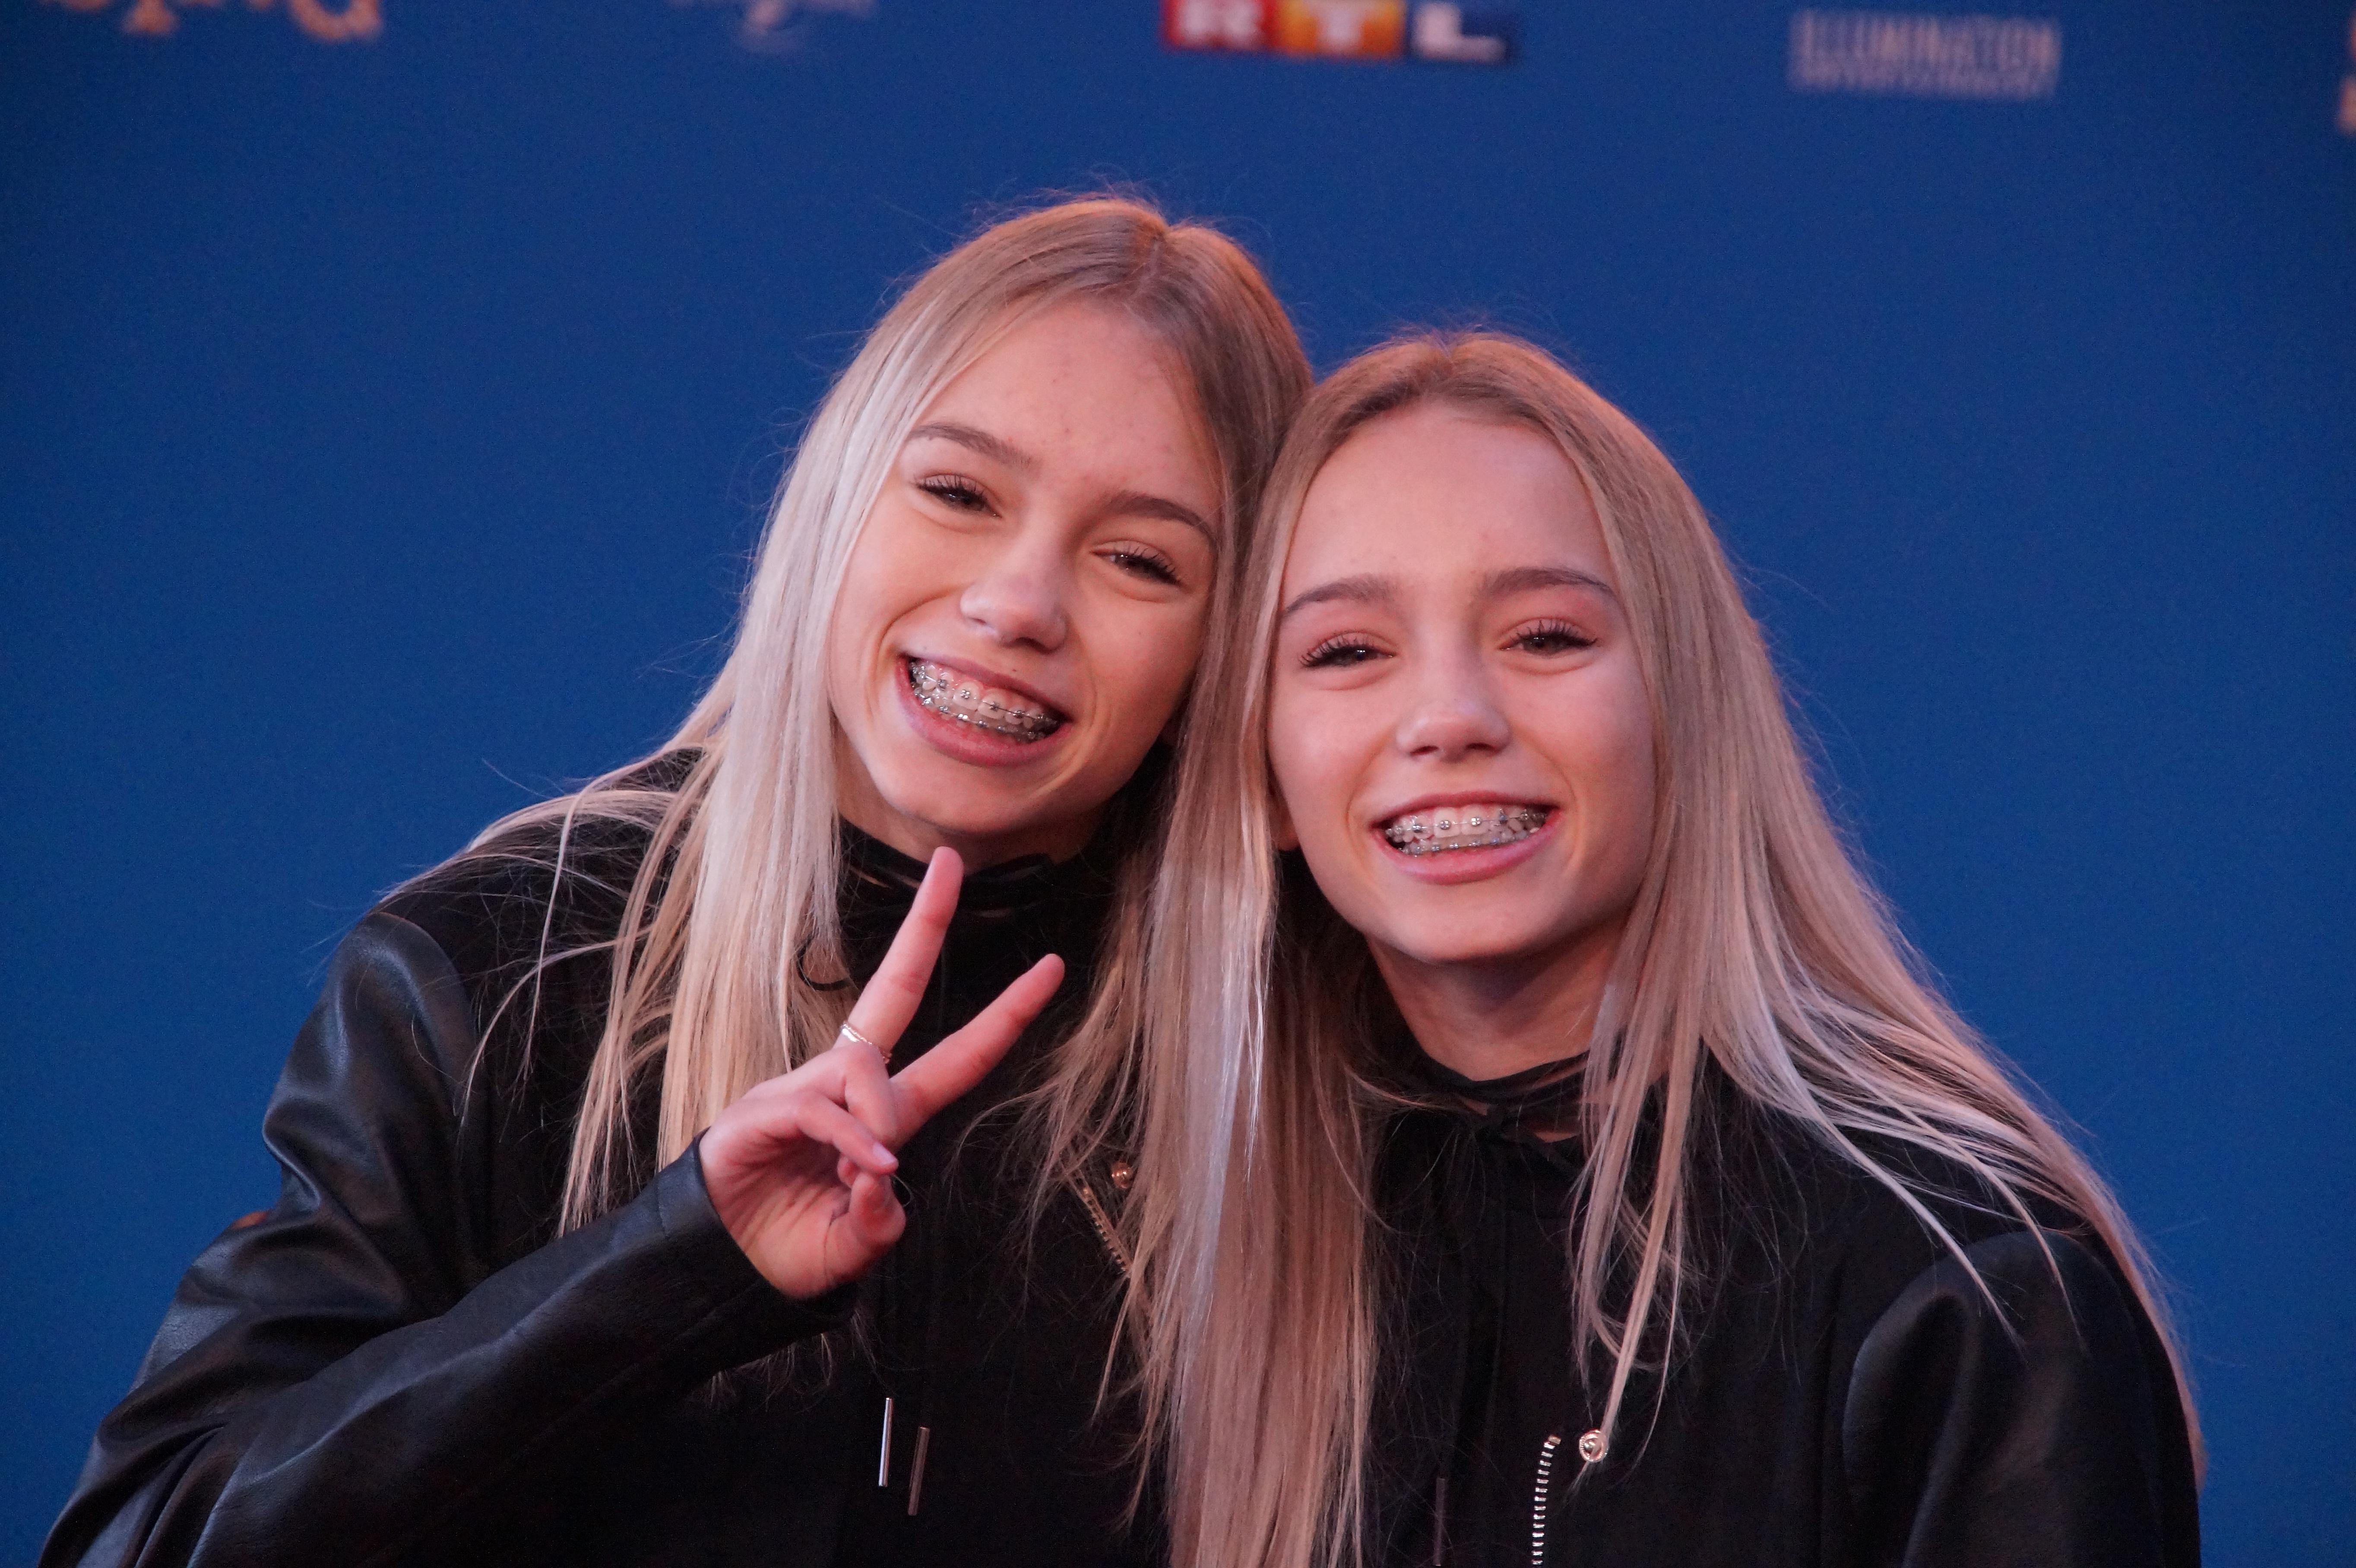 Lisa and Lena - Wikipedia